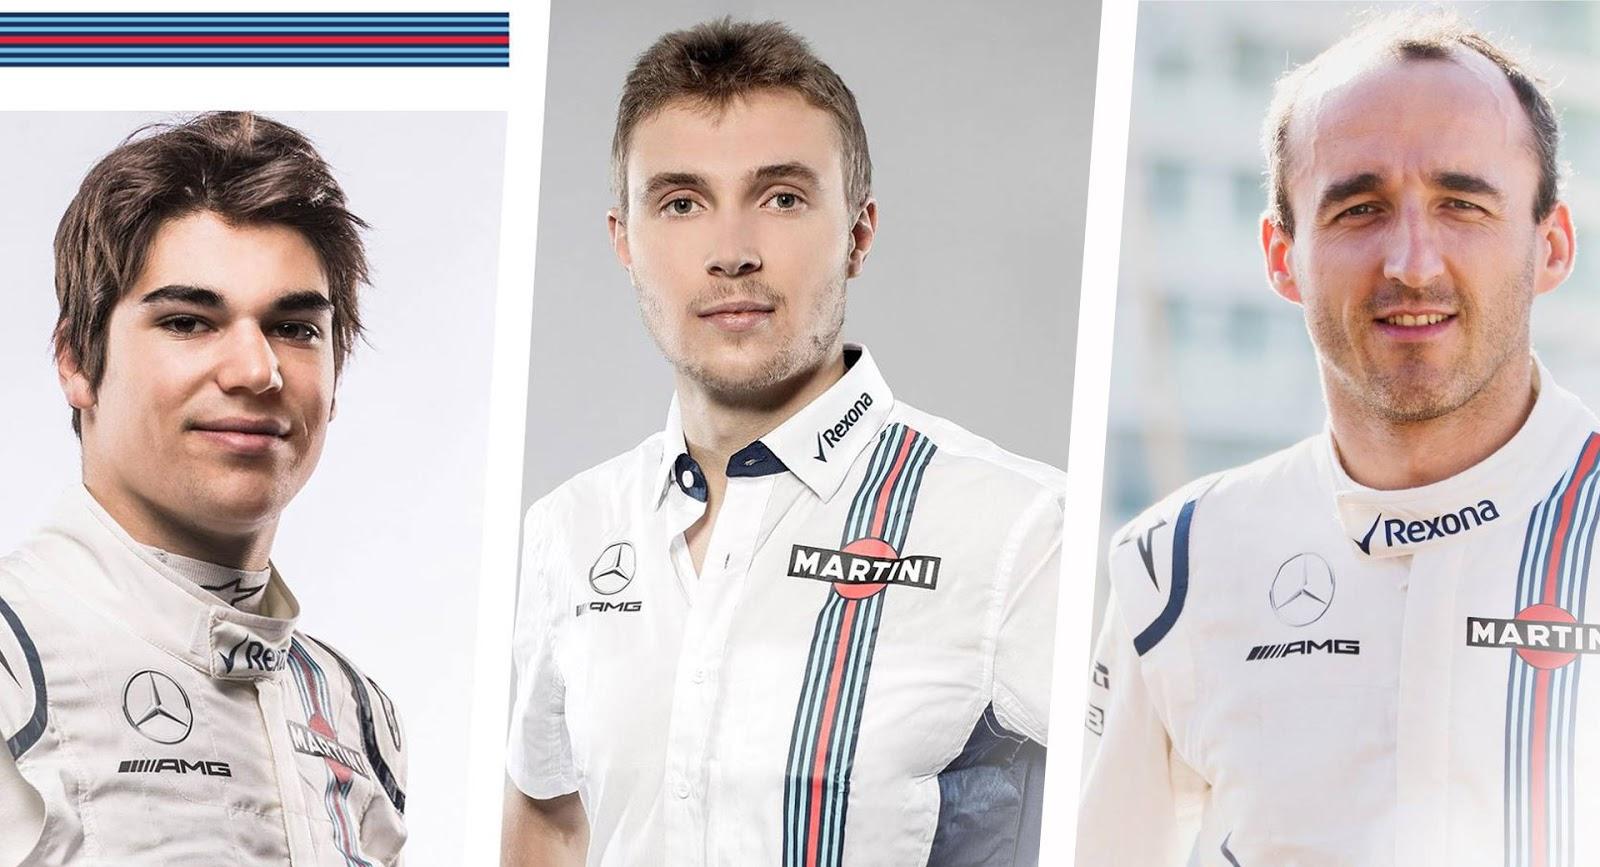 williams-drivers-2018.jpg